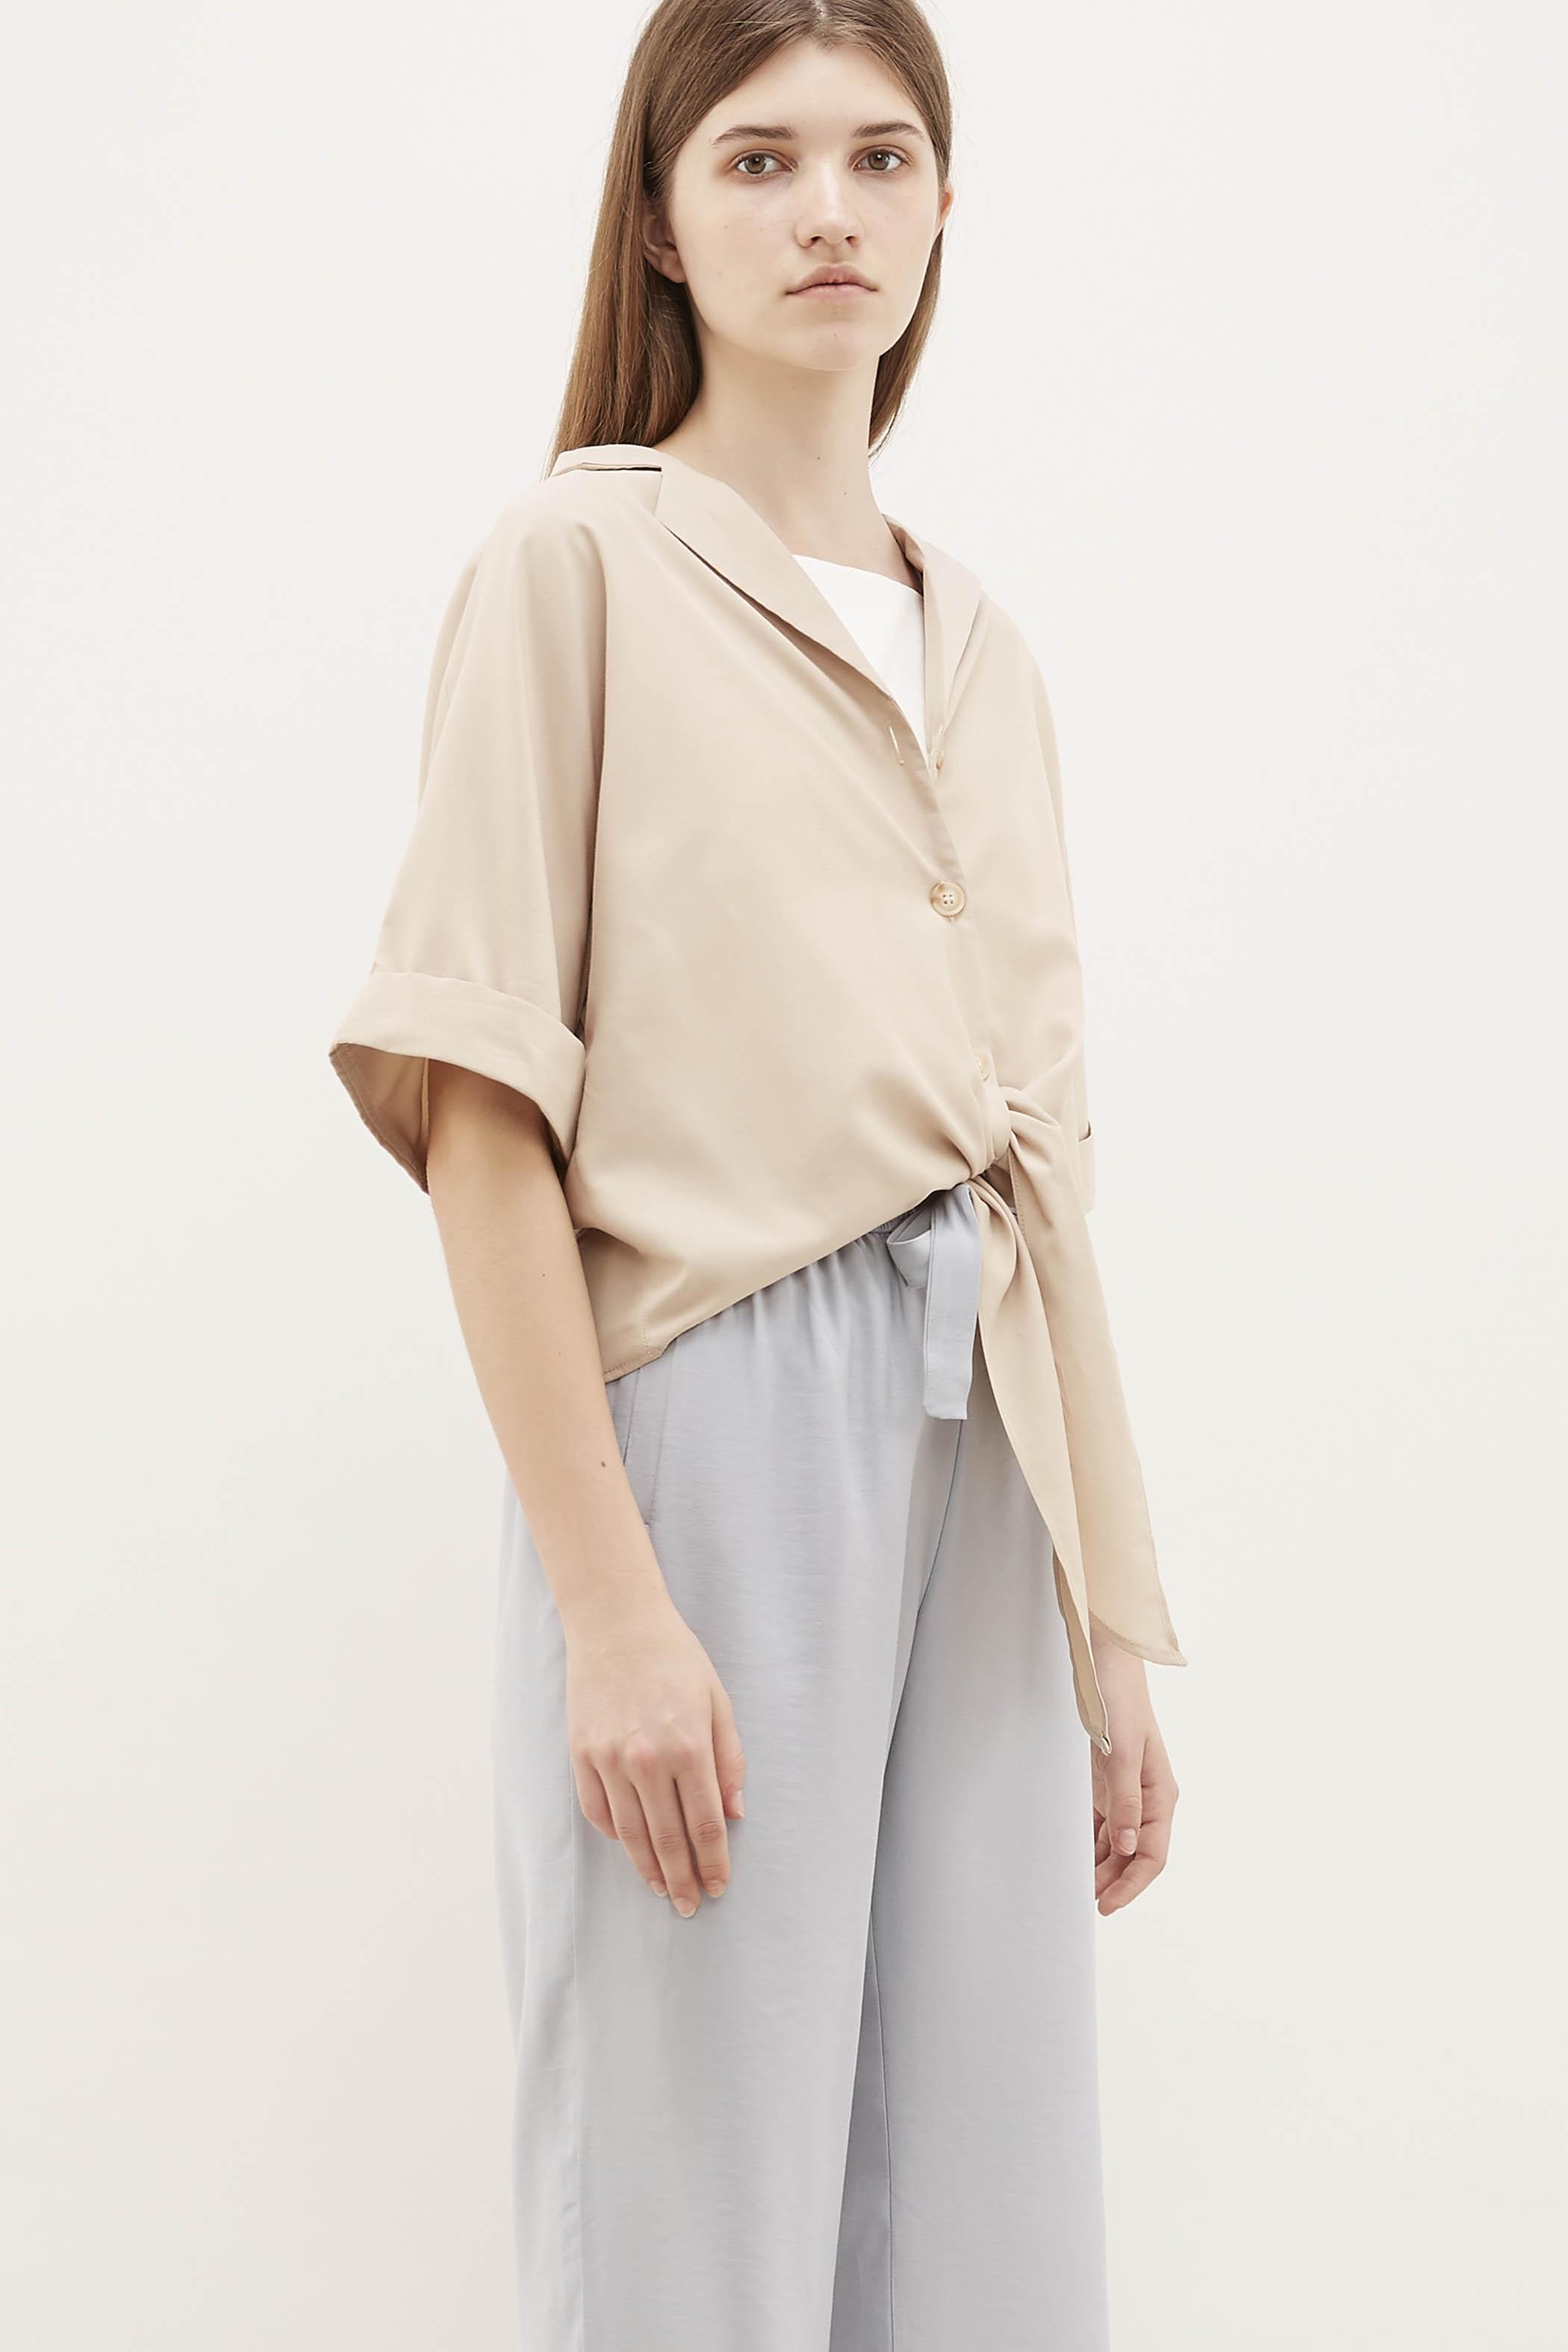 Juri Front-Tie Blouse